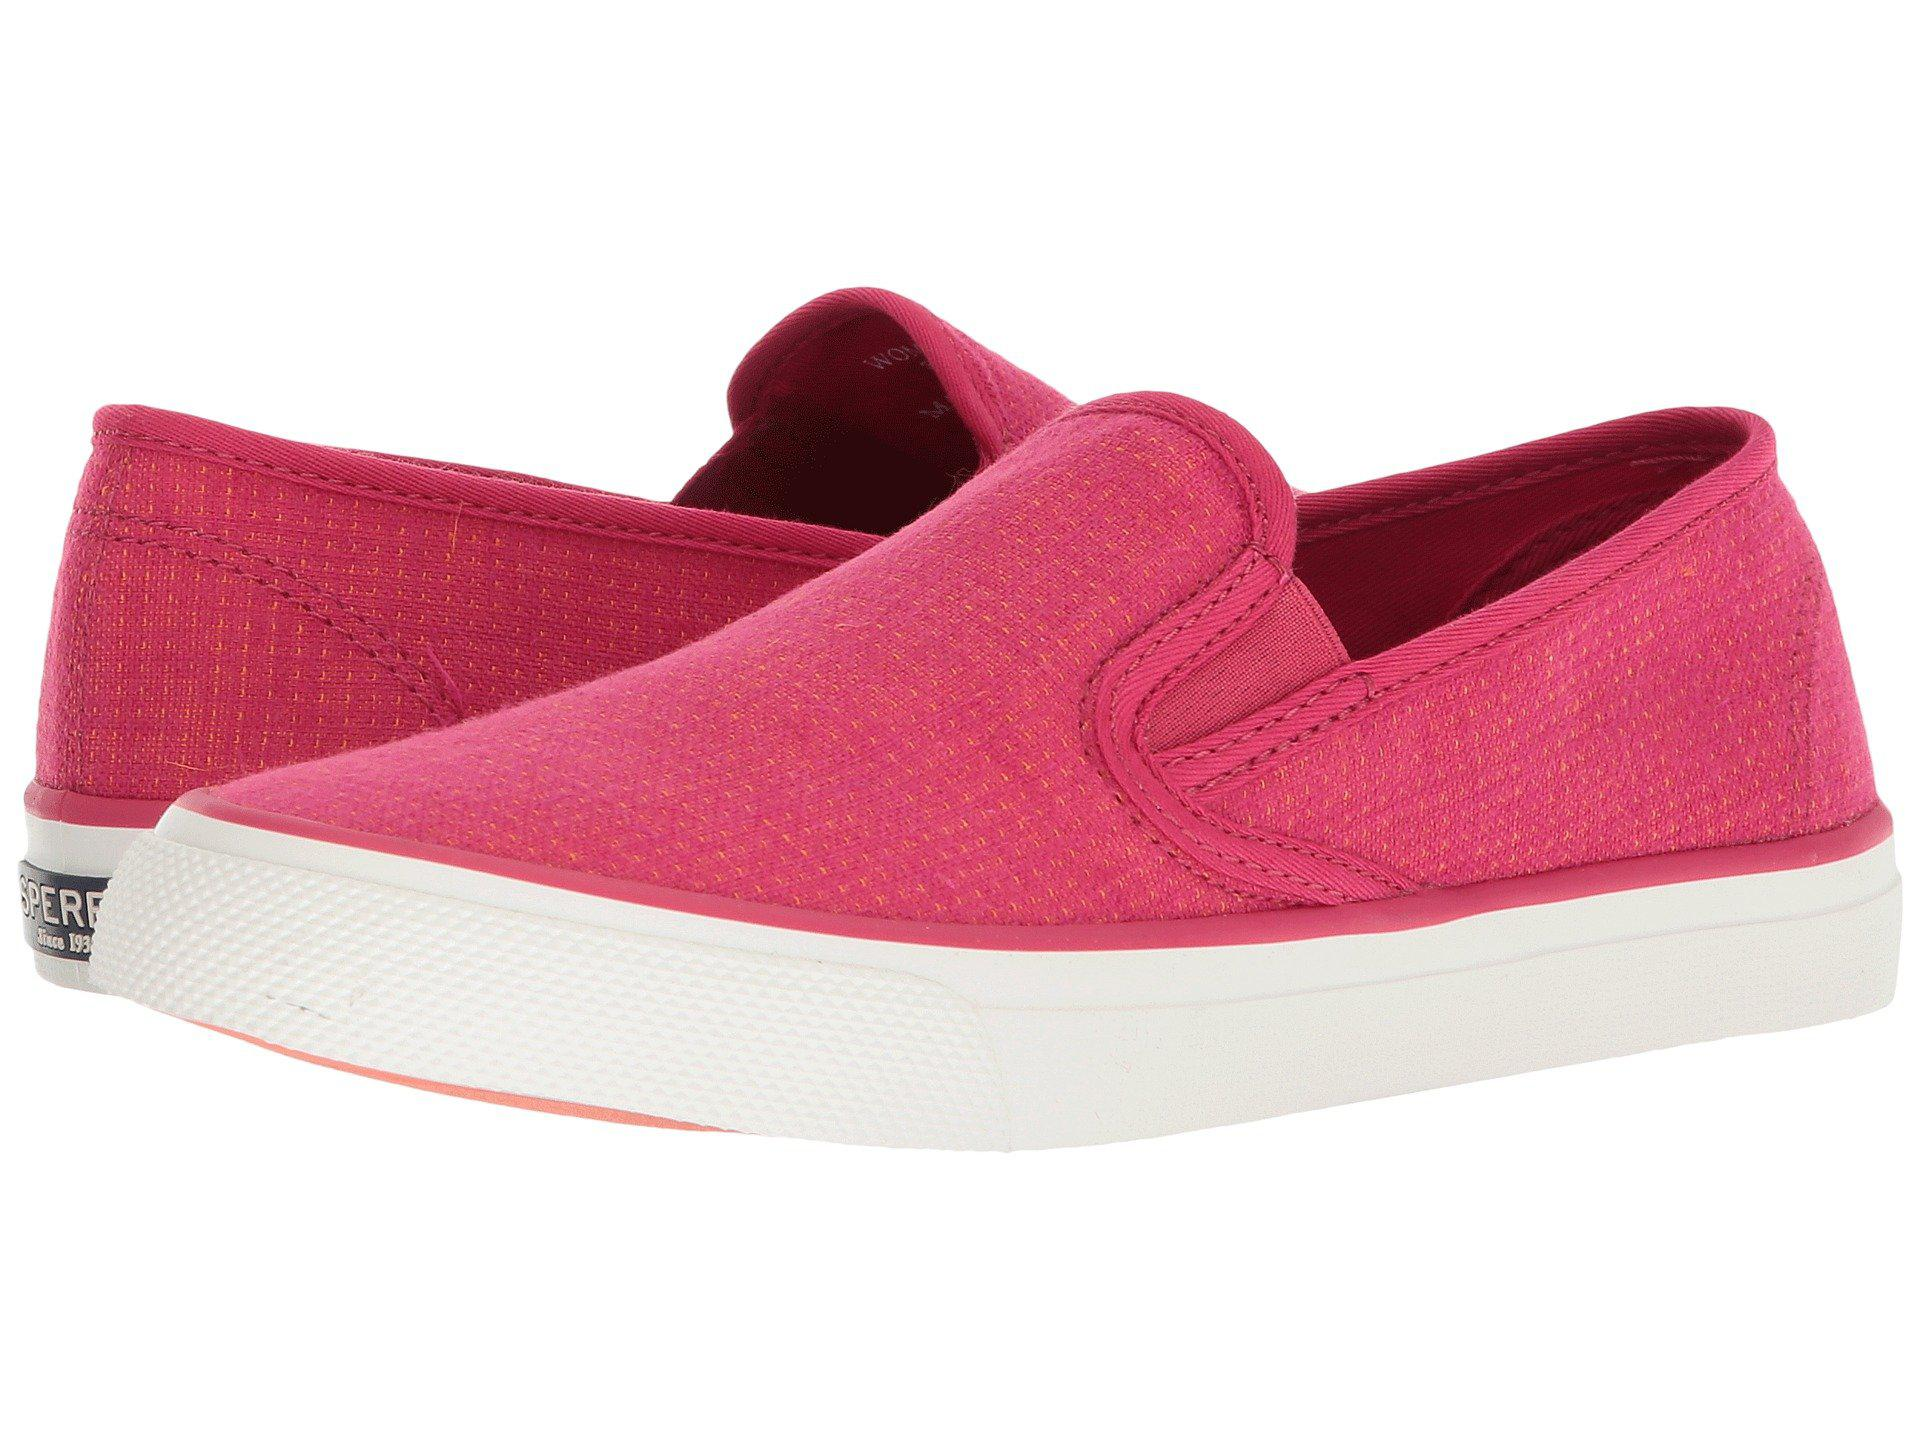 Seaside Two-Tone Linen Slip-On Sneakers vhPGrl